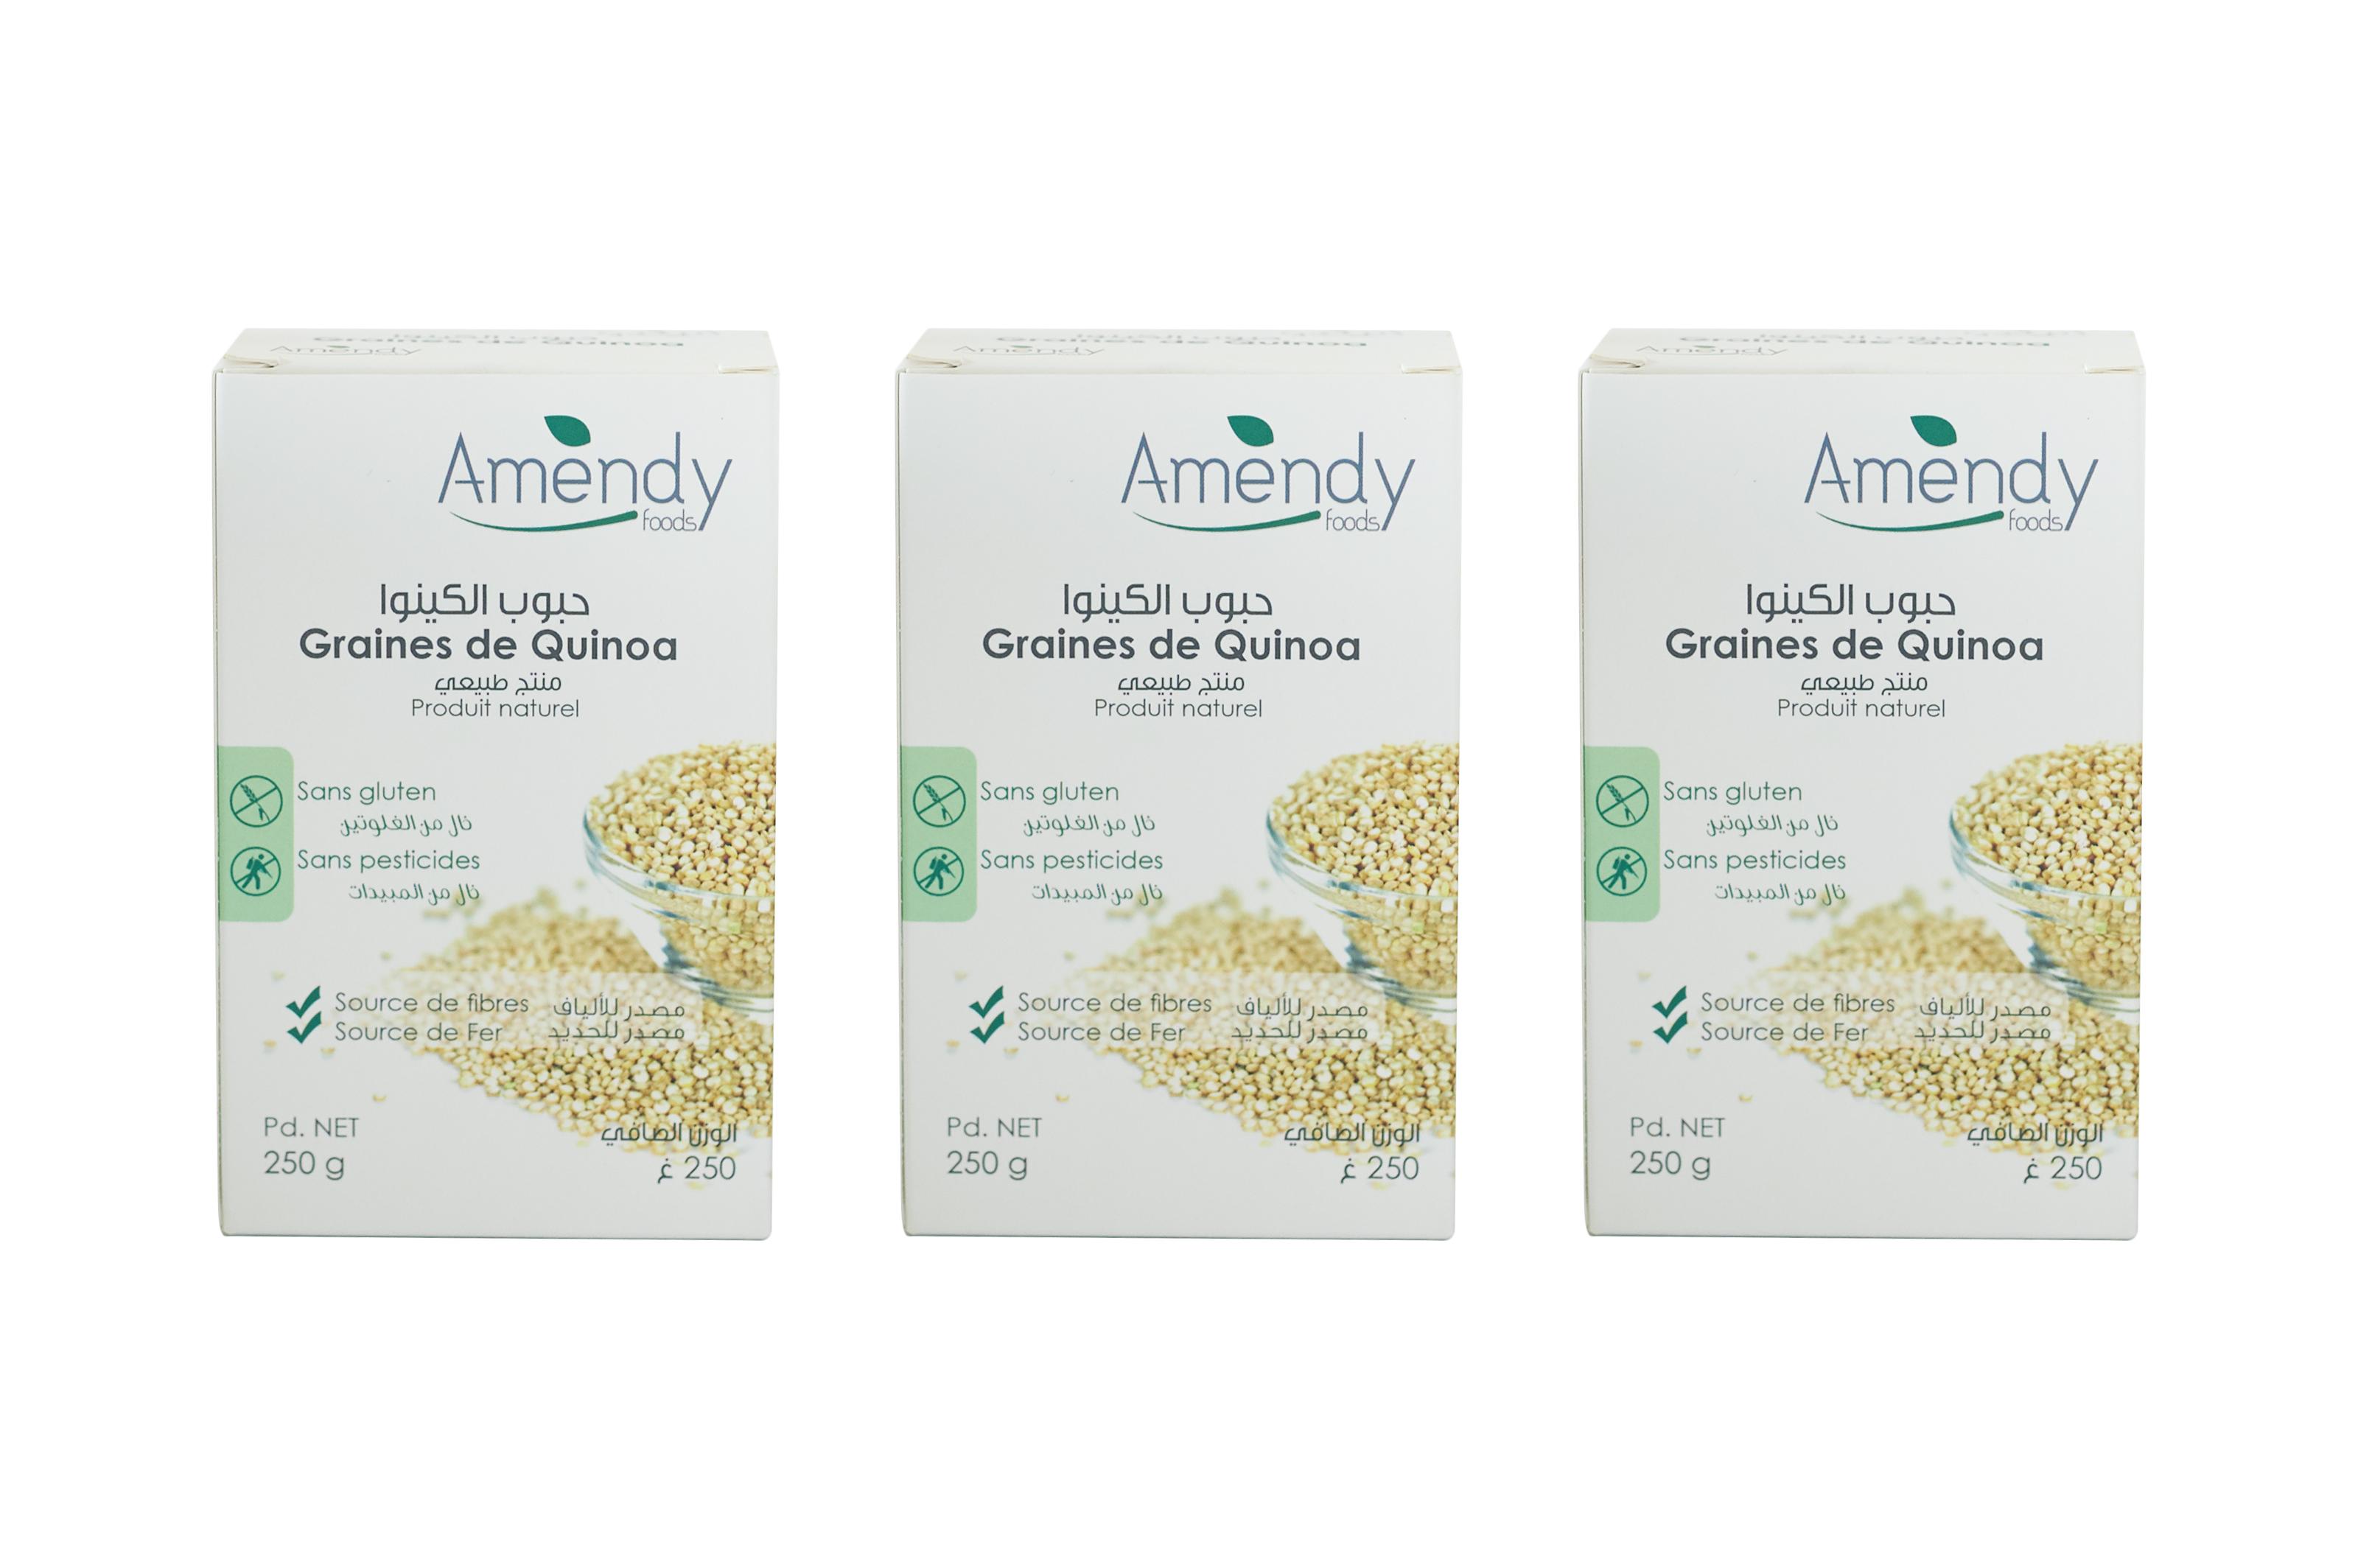 Produit Graines de Quinoa (250g)